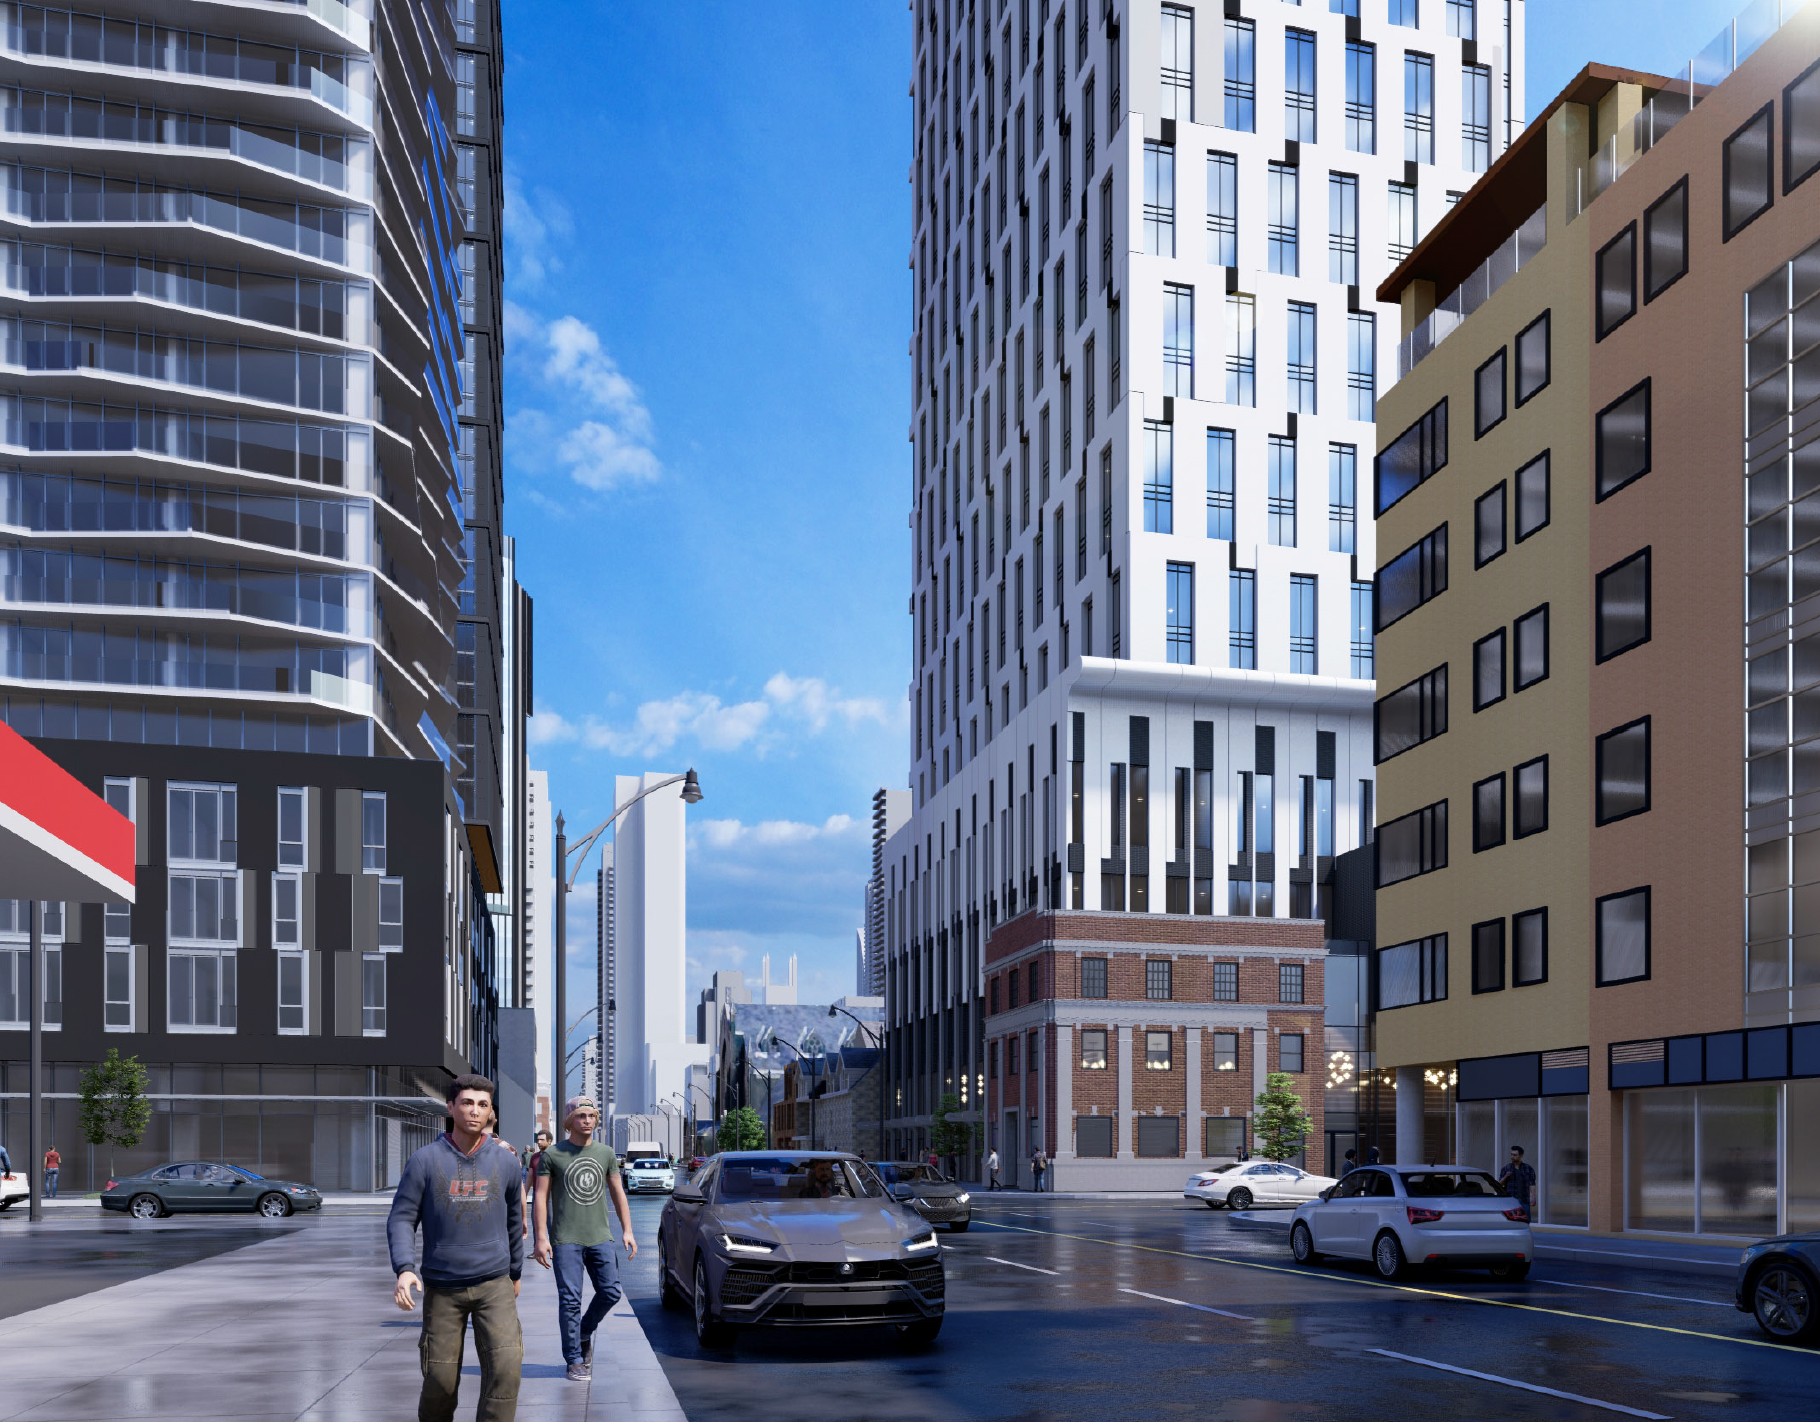 250 Church Street, Toronto, designed by IBI Group for CentreCourt.